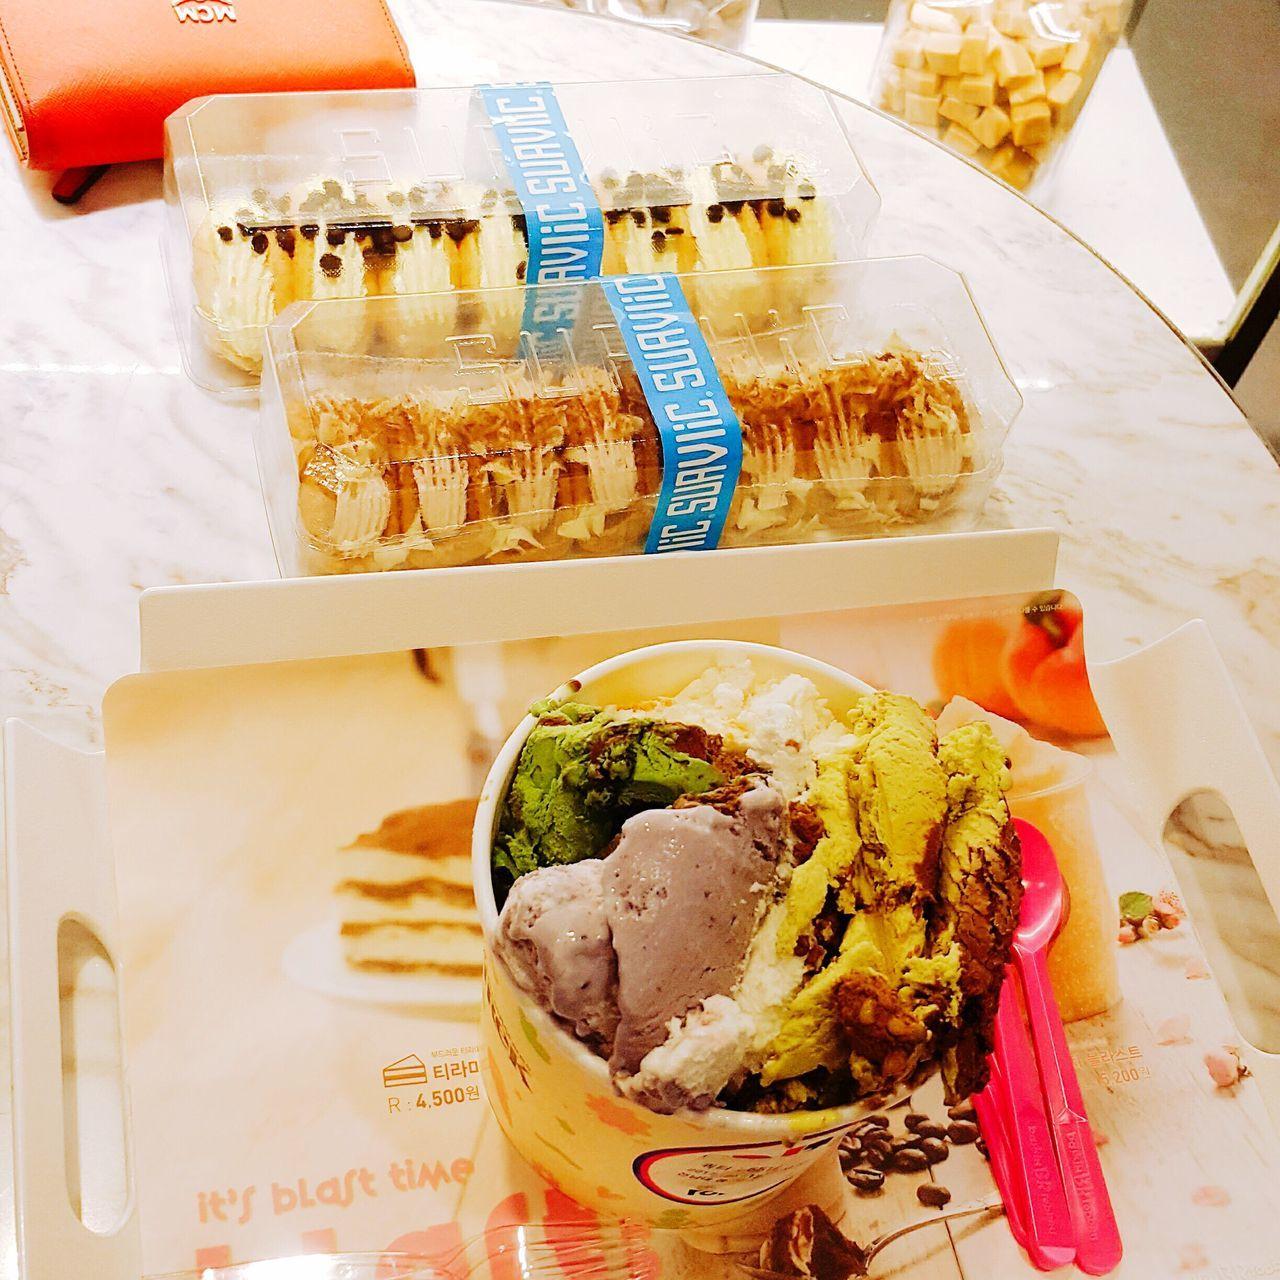 Ready-to-eat Dessert Desserts Ice Cream Gelato Sweet Food